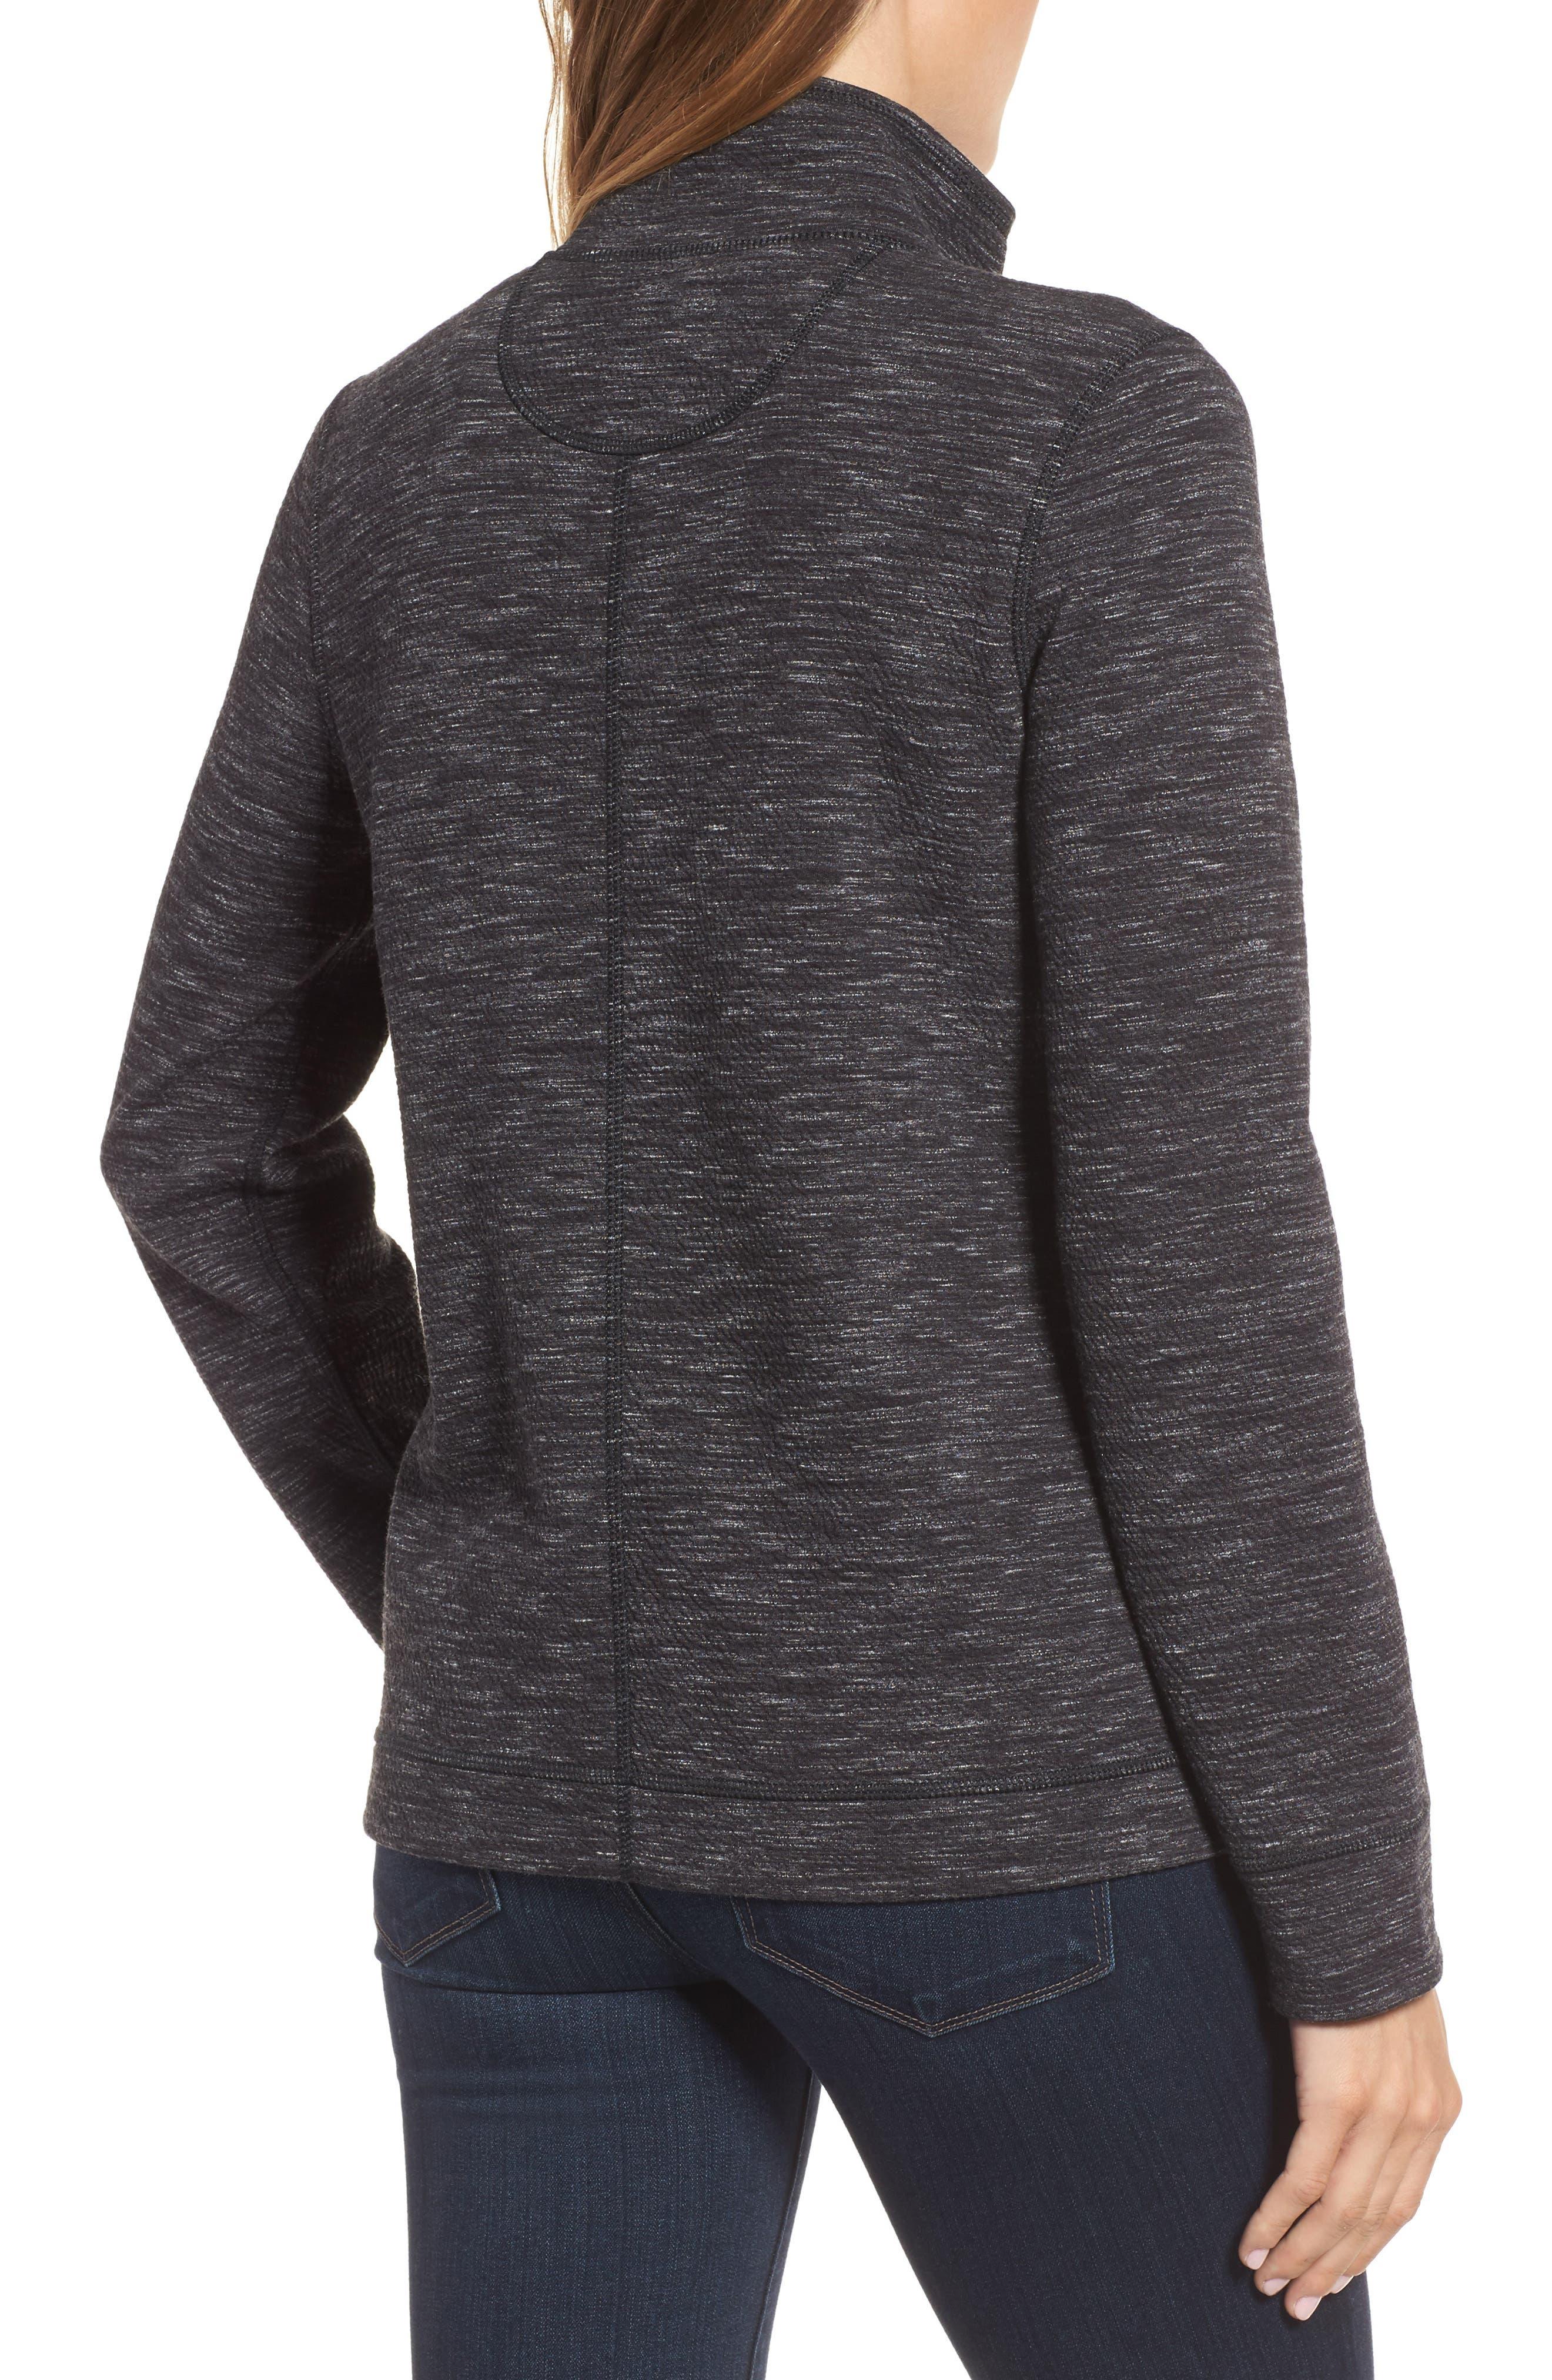 Reversible Marled Knit Jacket,                             Alternate thumbnail 2, color,                             021